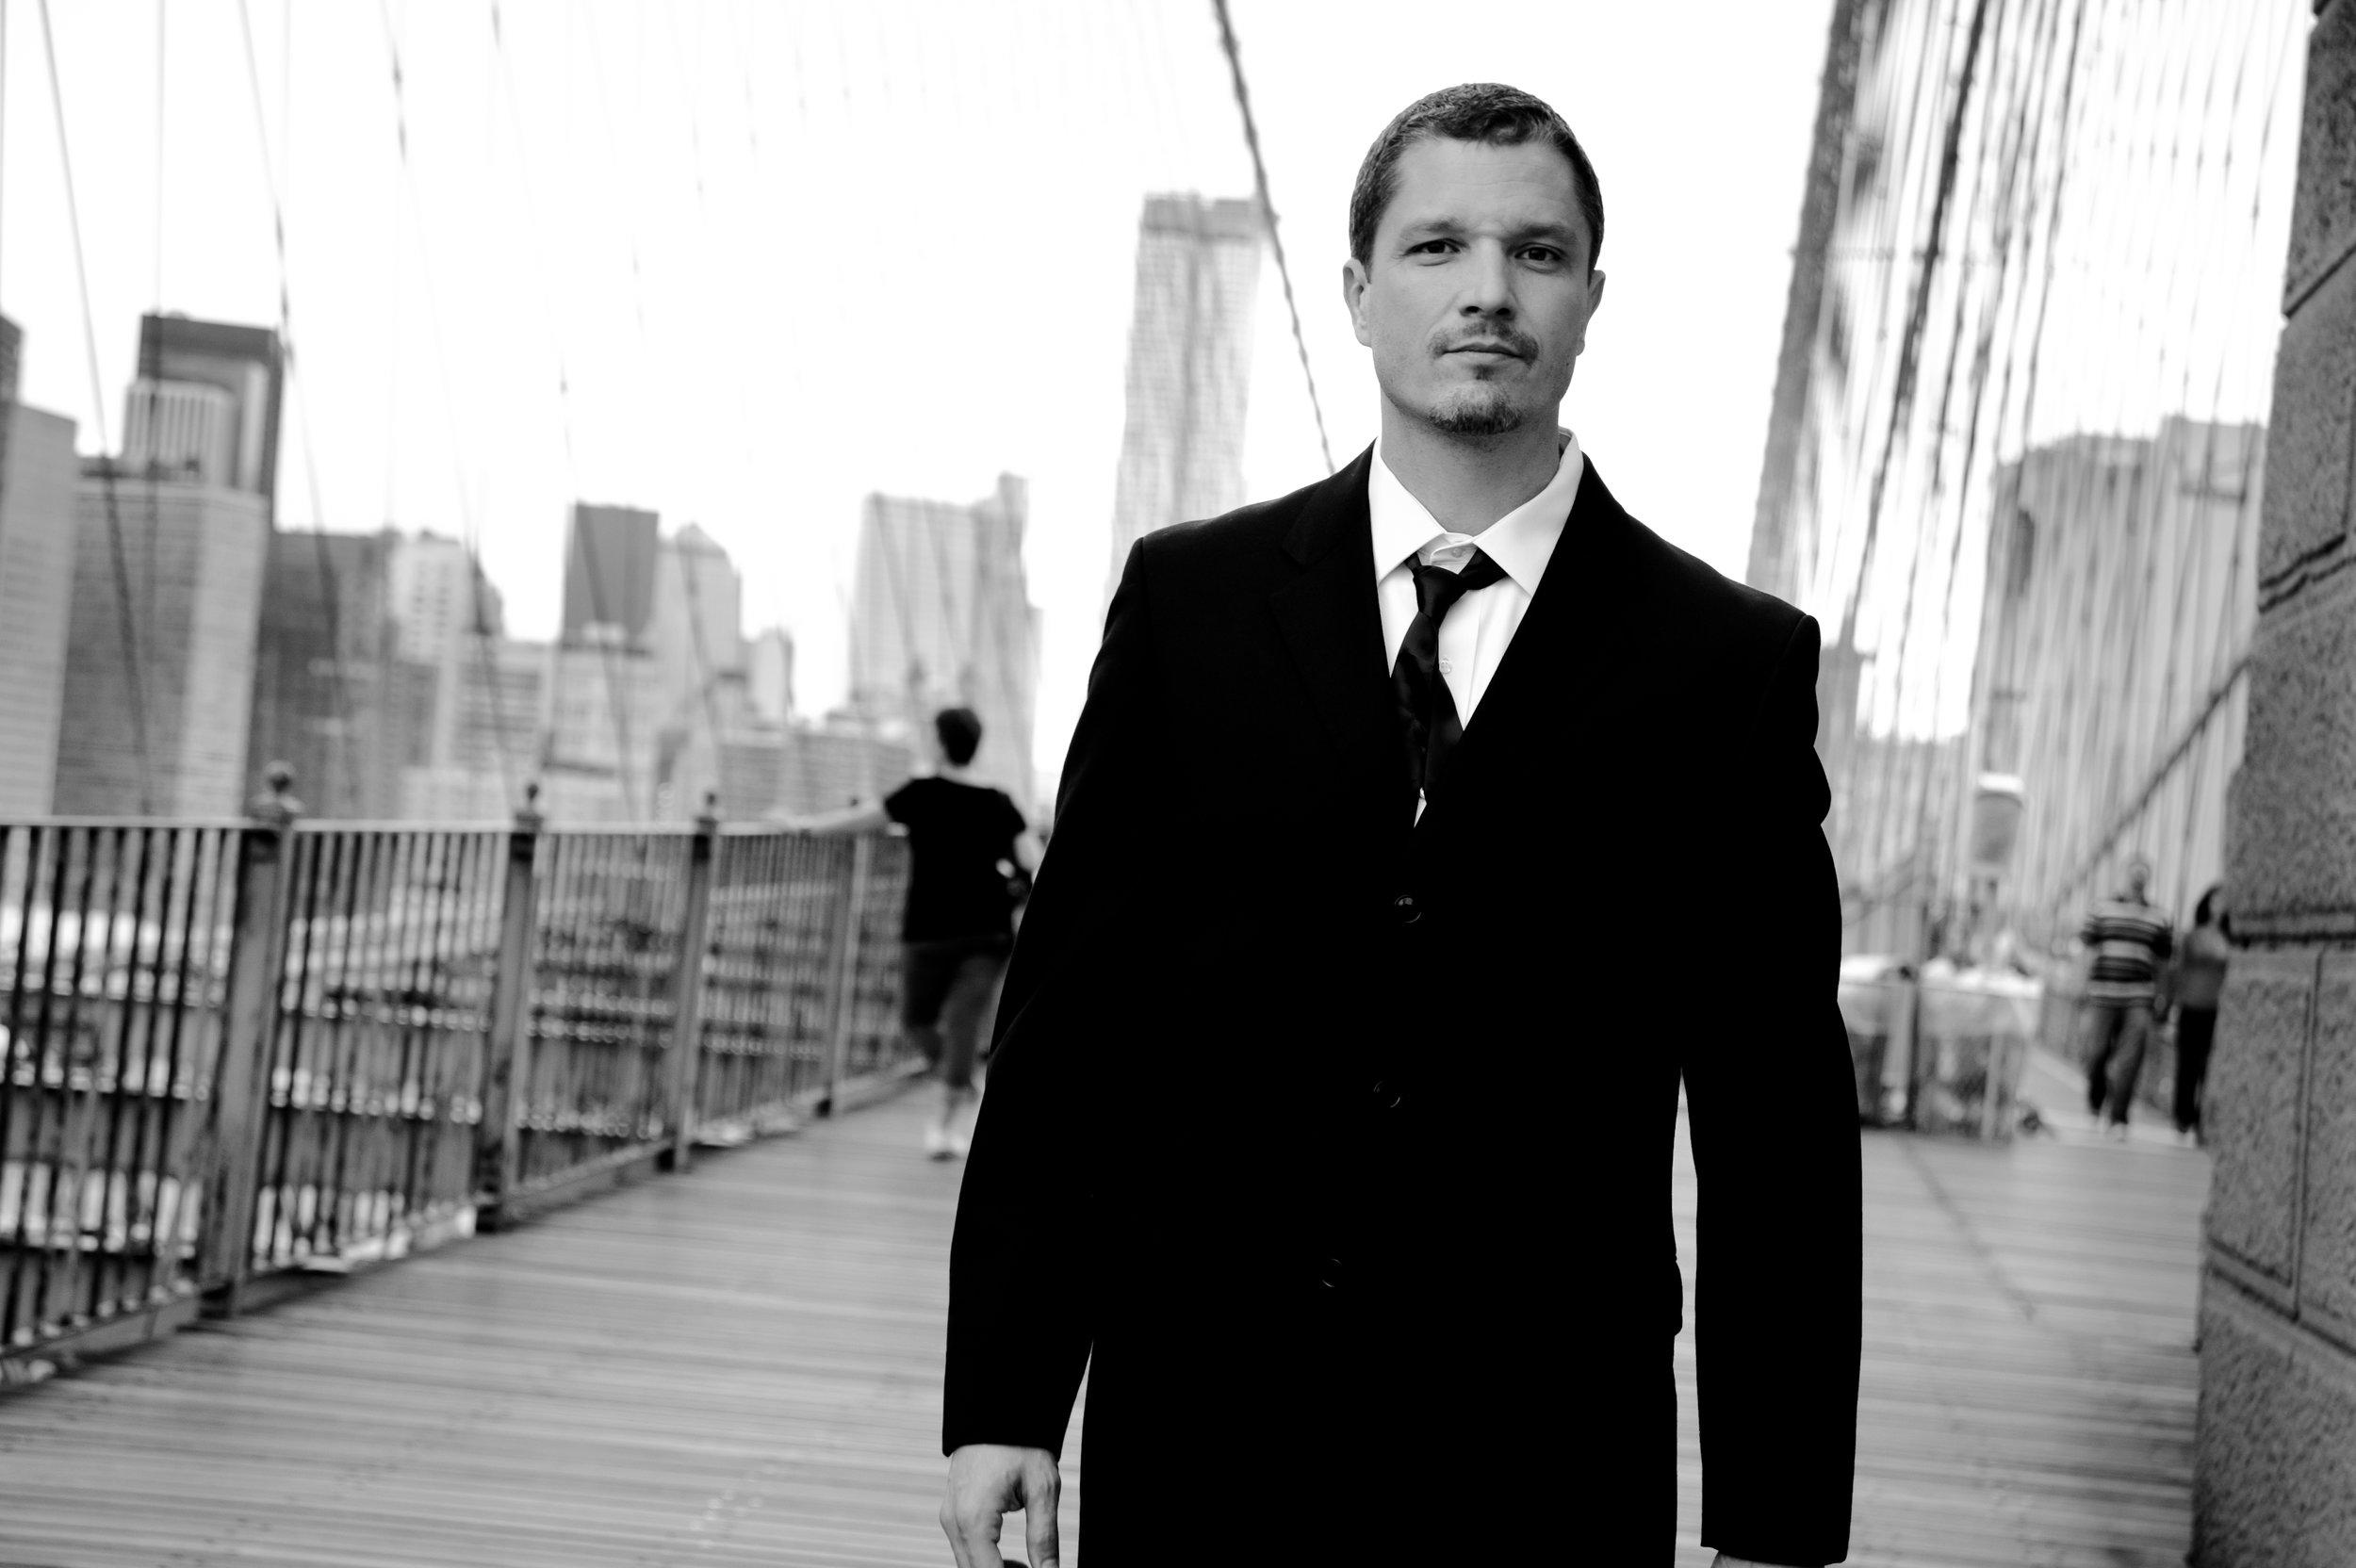 Dominik Tiefenthaler, photo by Julia Tyrrell